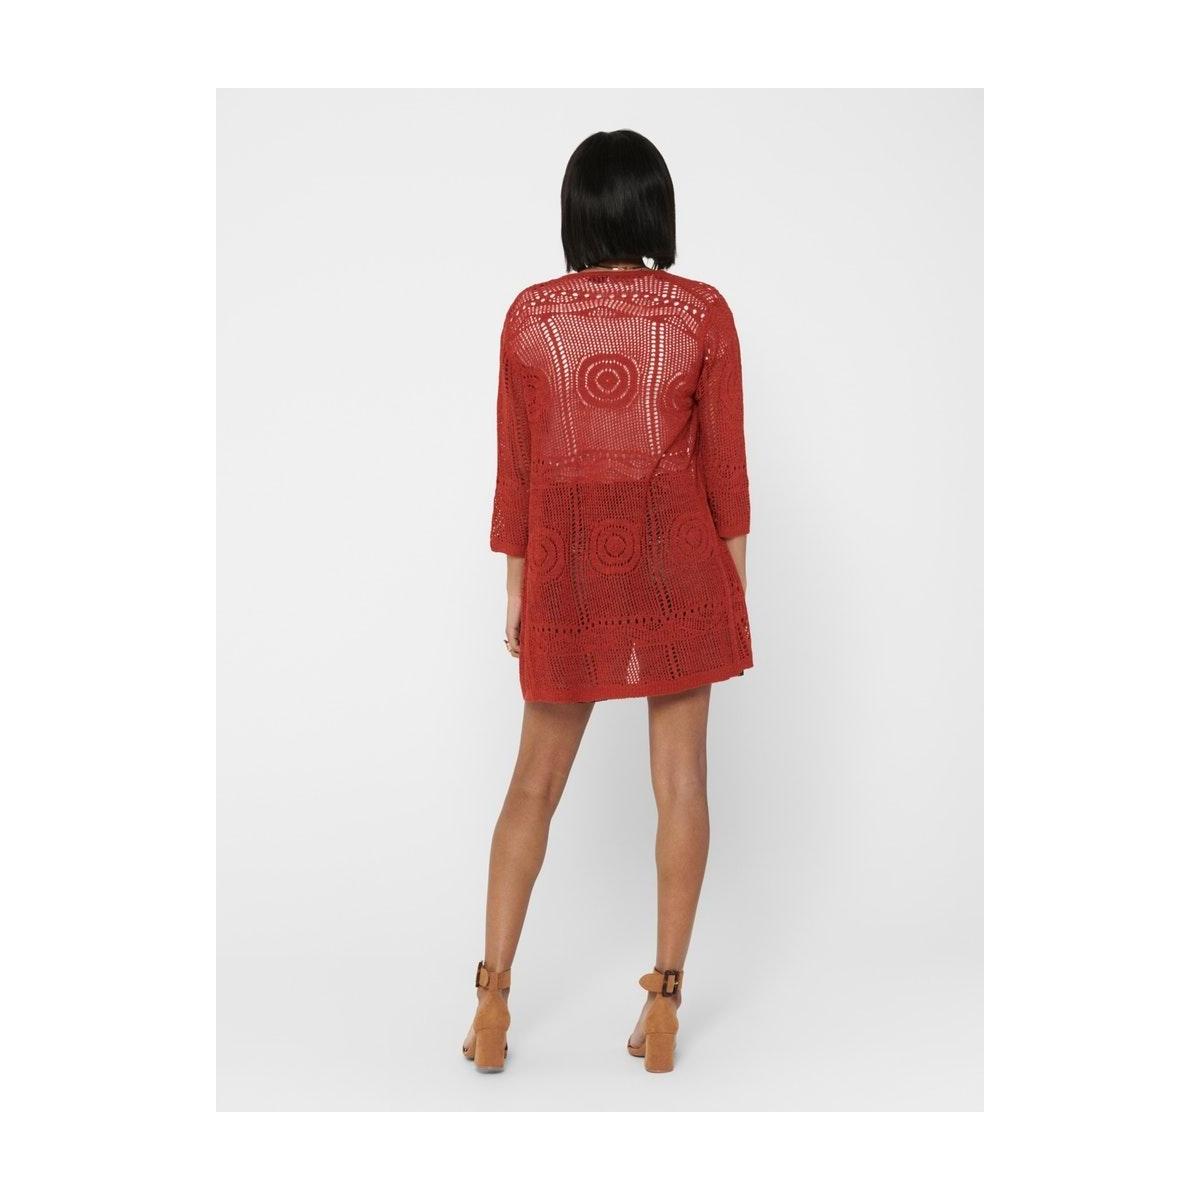 jdykofi 3/4 kimono knt denim 15200527 jacqueline de yong vest bossa nova